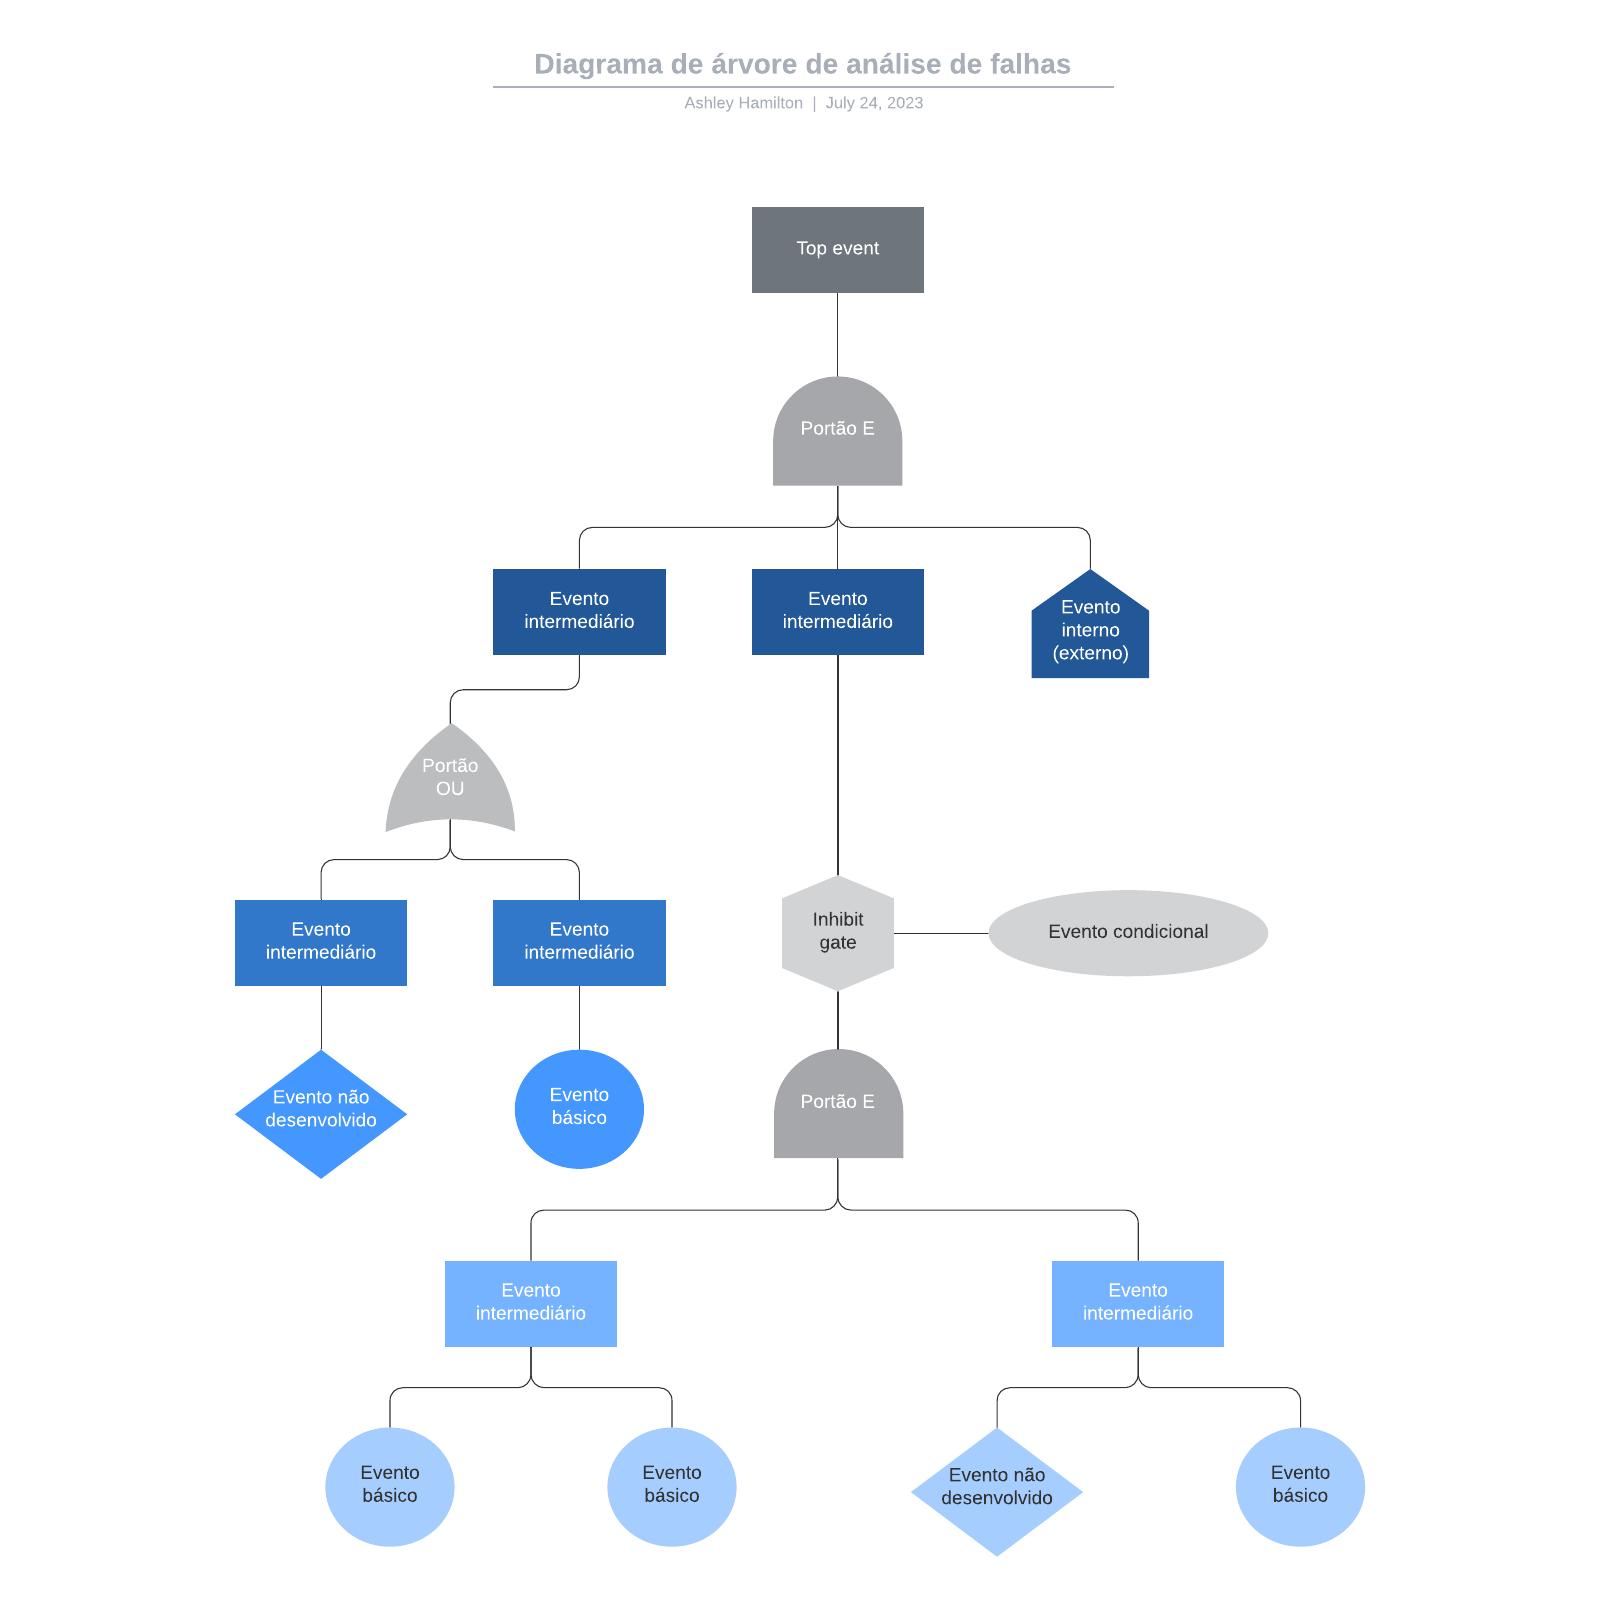 Diagrama de árvore de análise de falhas